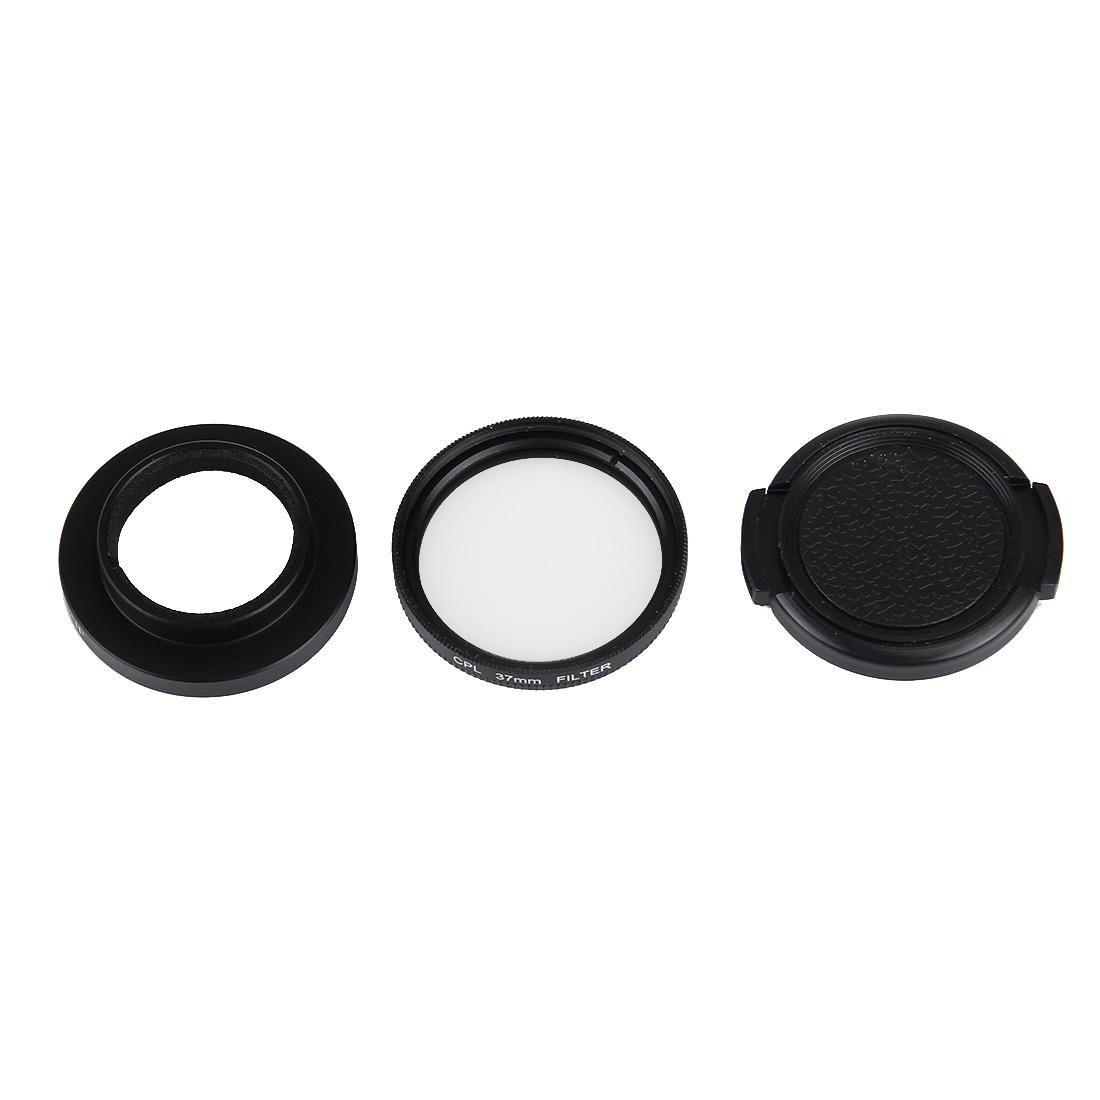 LAILINSHENG Camera Accessories JUNESTAR for Xiaomi Xiaoyi Yi II 4K Sport Action Camera Proffesional 37mm CPL Filter Lens Protective Cap